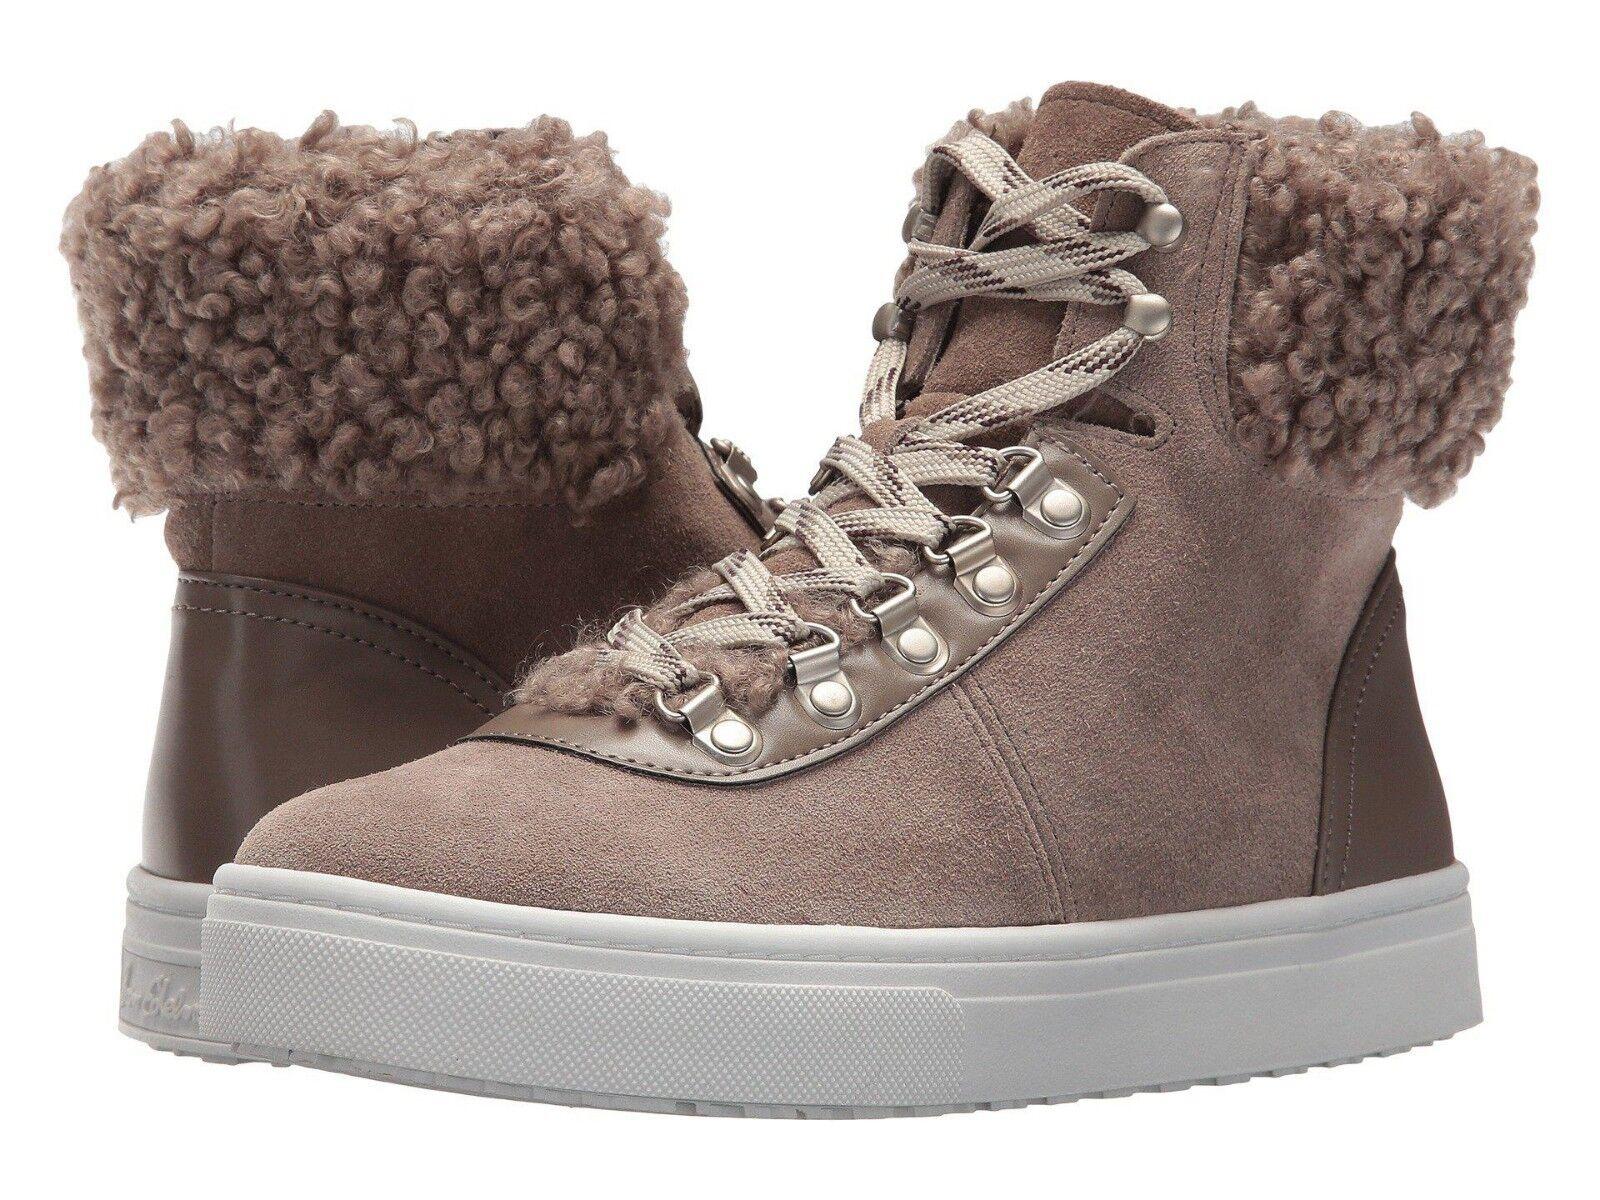 negozio di vendita outlet Sam Edelman Luther donna donna donna Dimensione 8.5M Putty Suede Faux Shearling scarpe da ginnastica avvioies  alta qualità generale